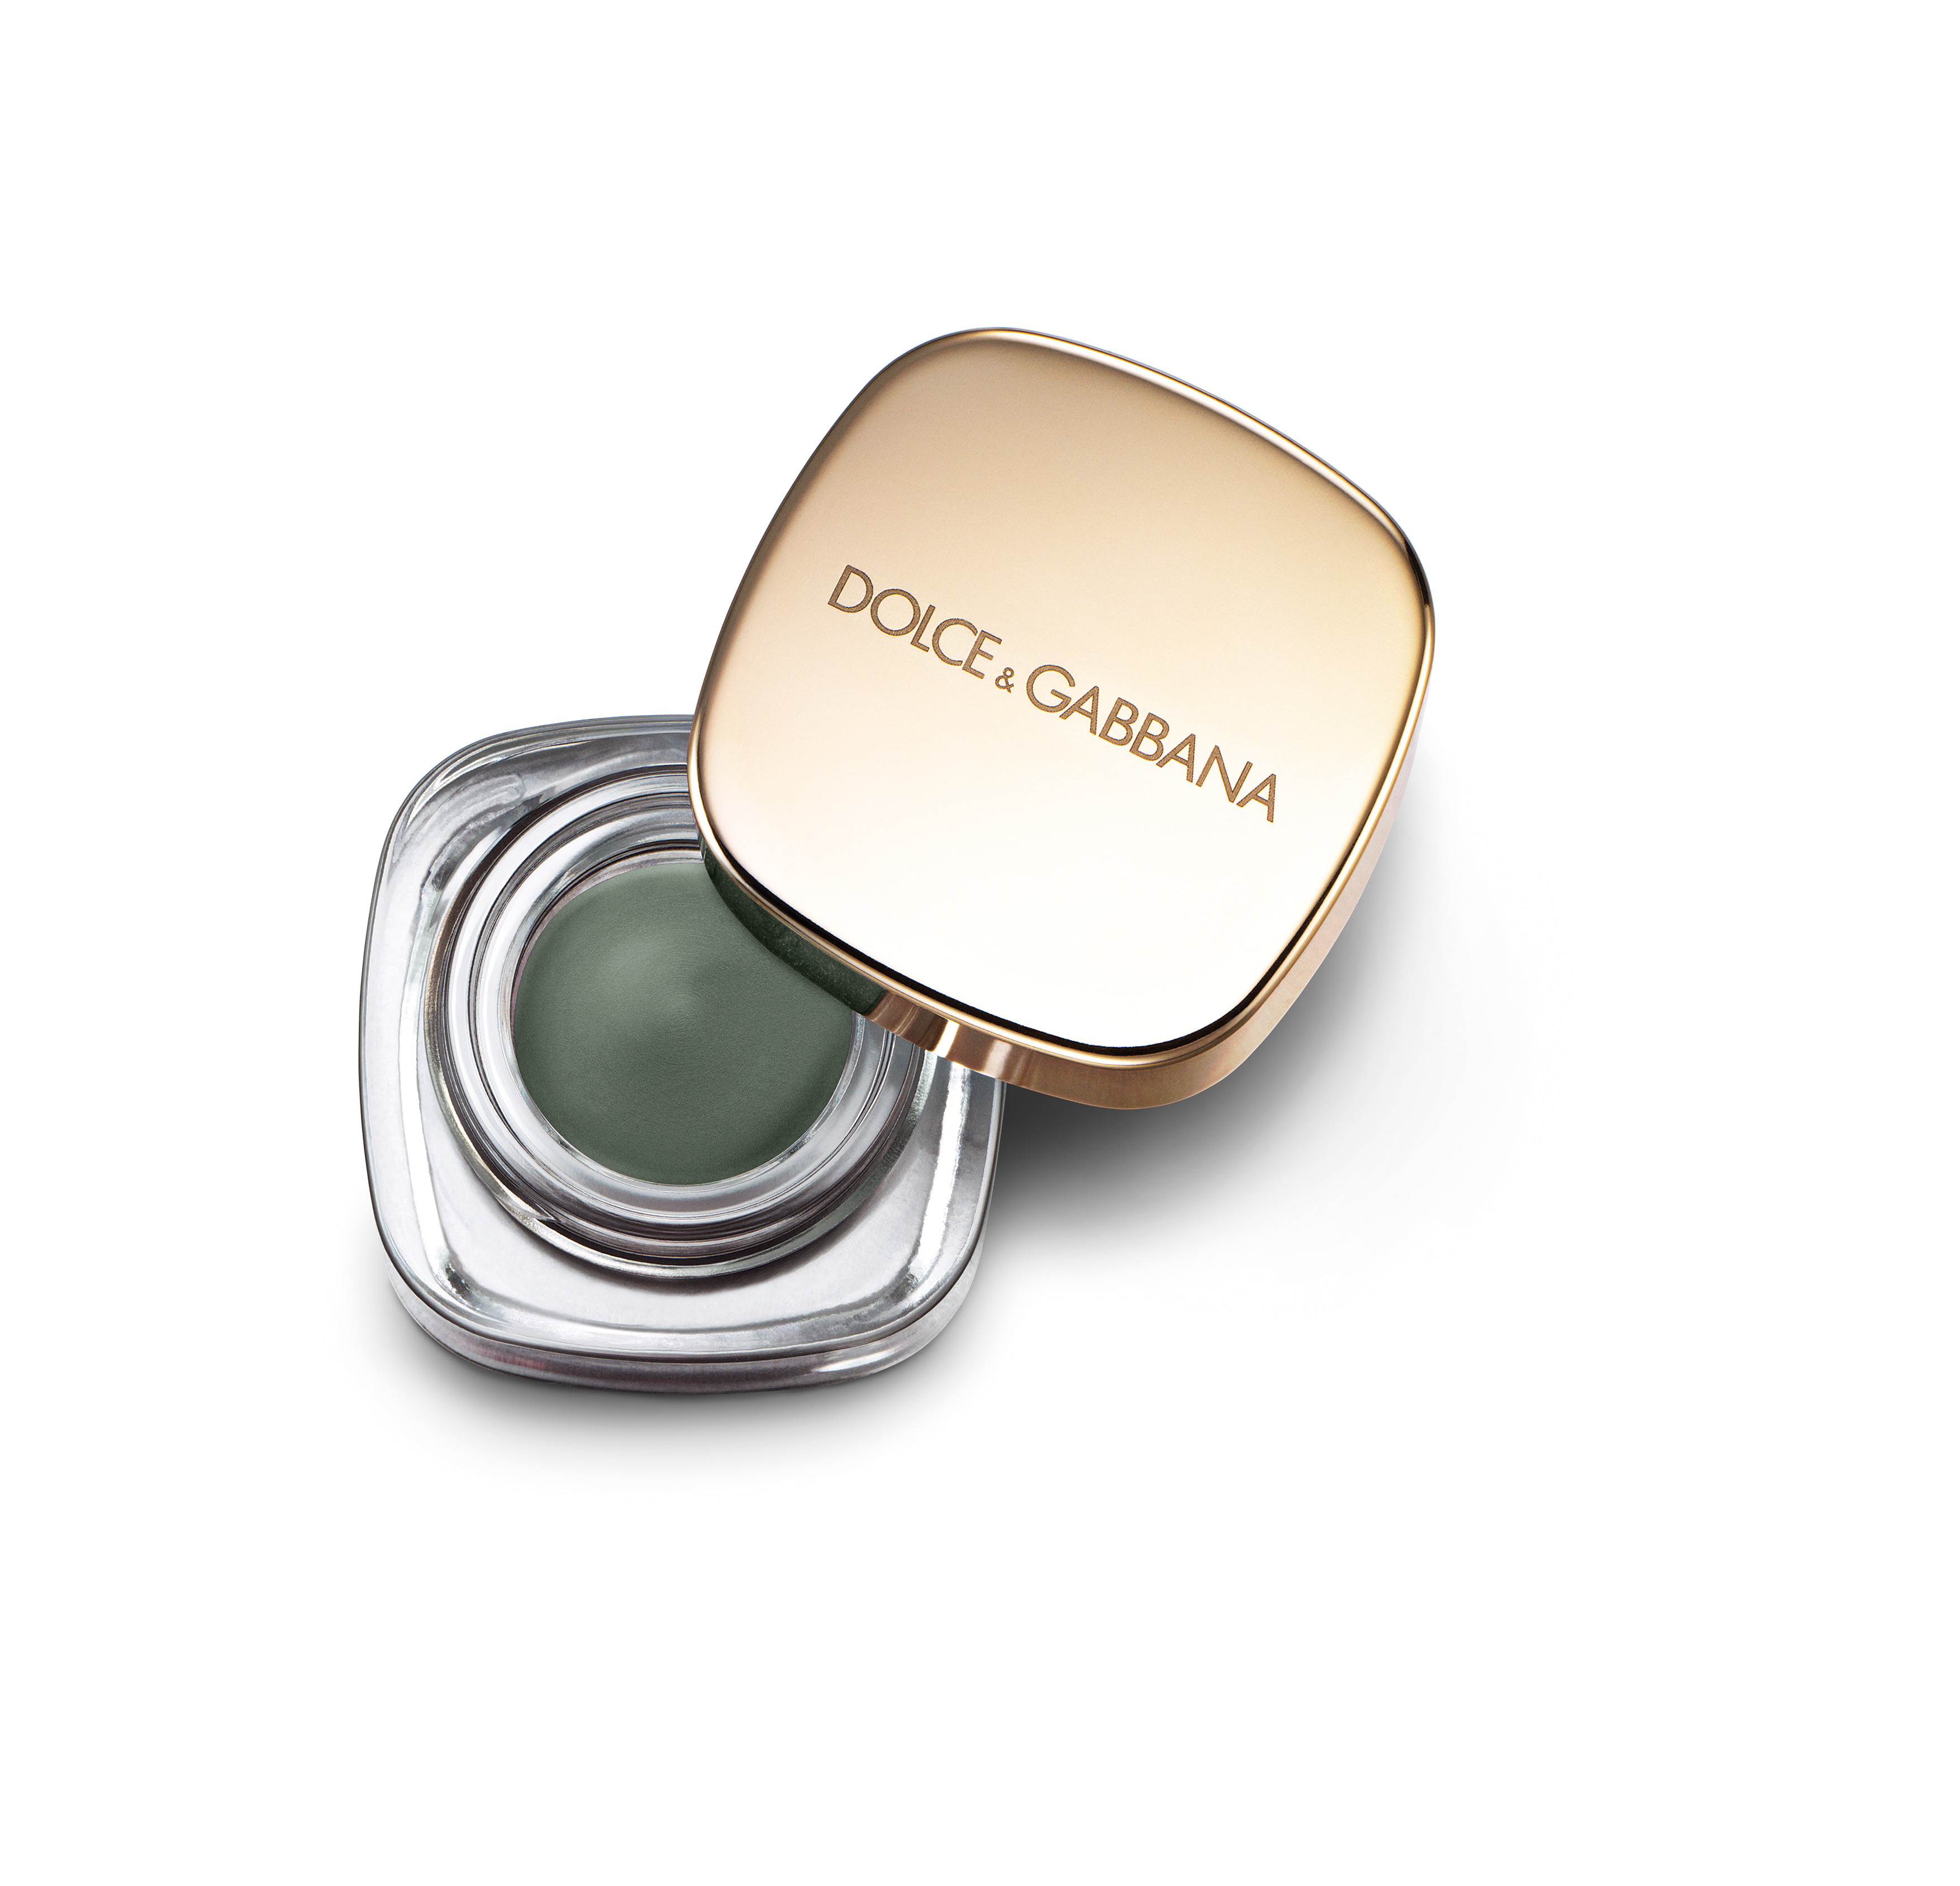 Dolce & Gabbana Perfect Mono Sage 070